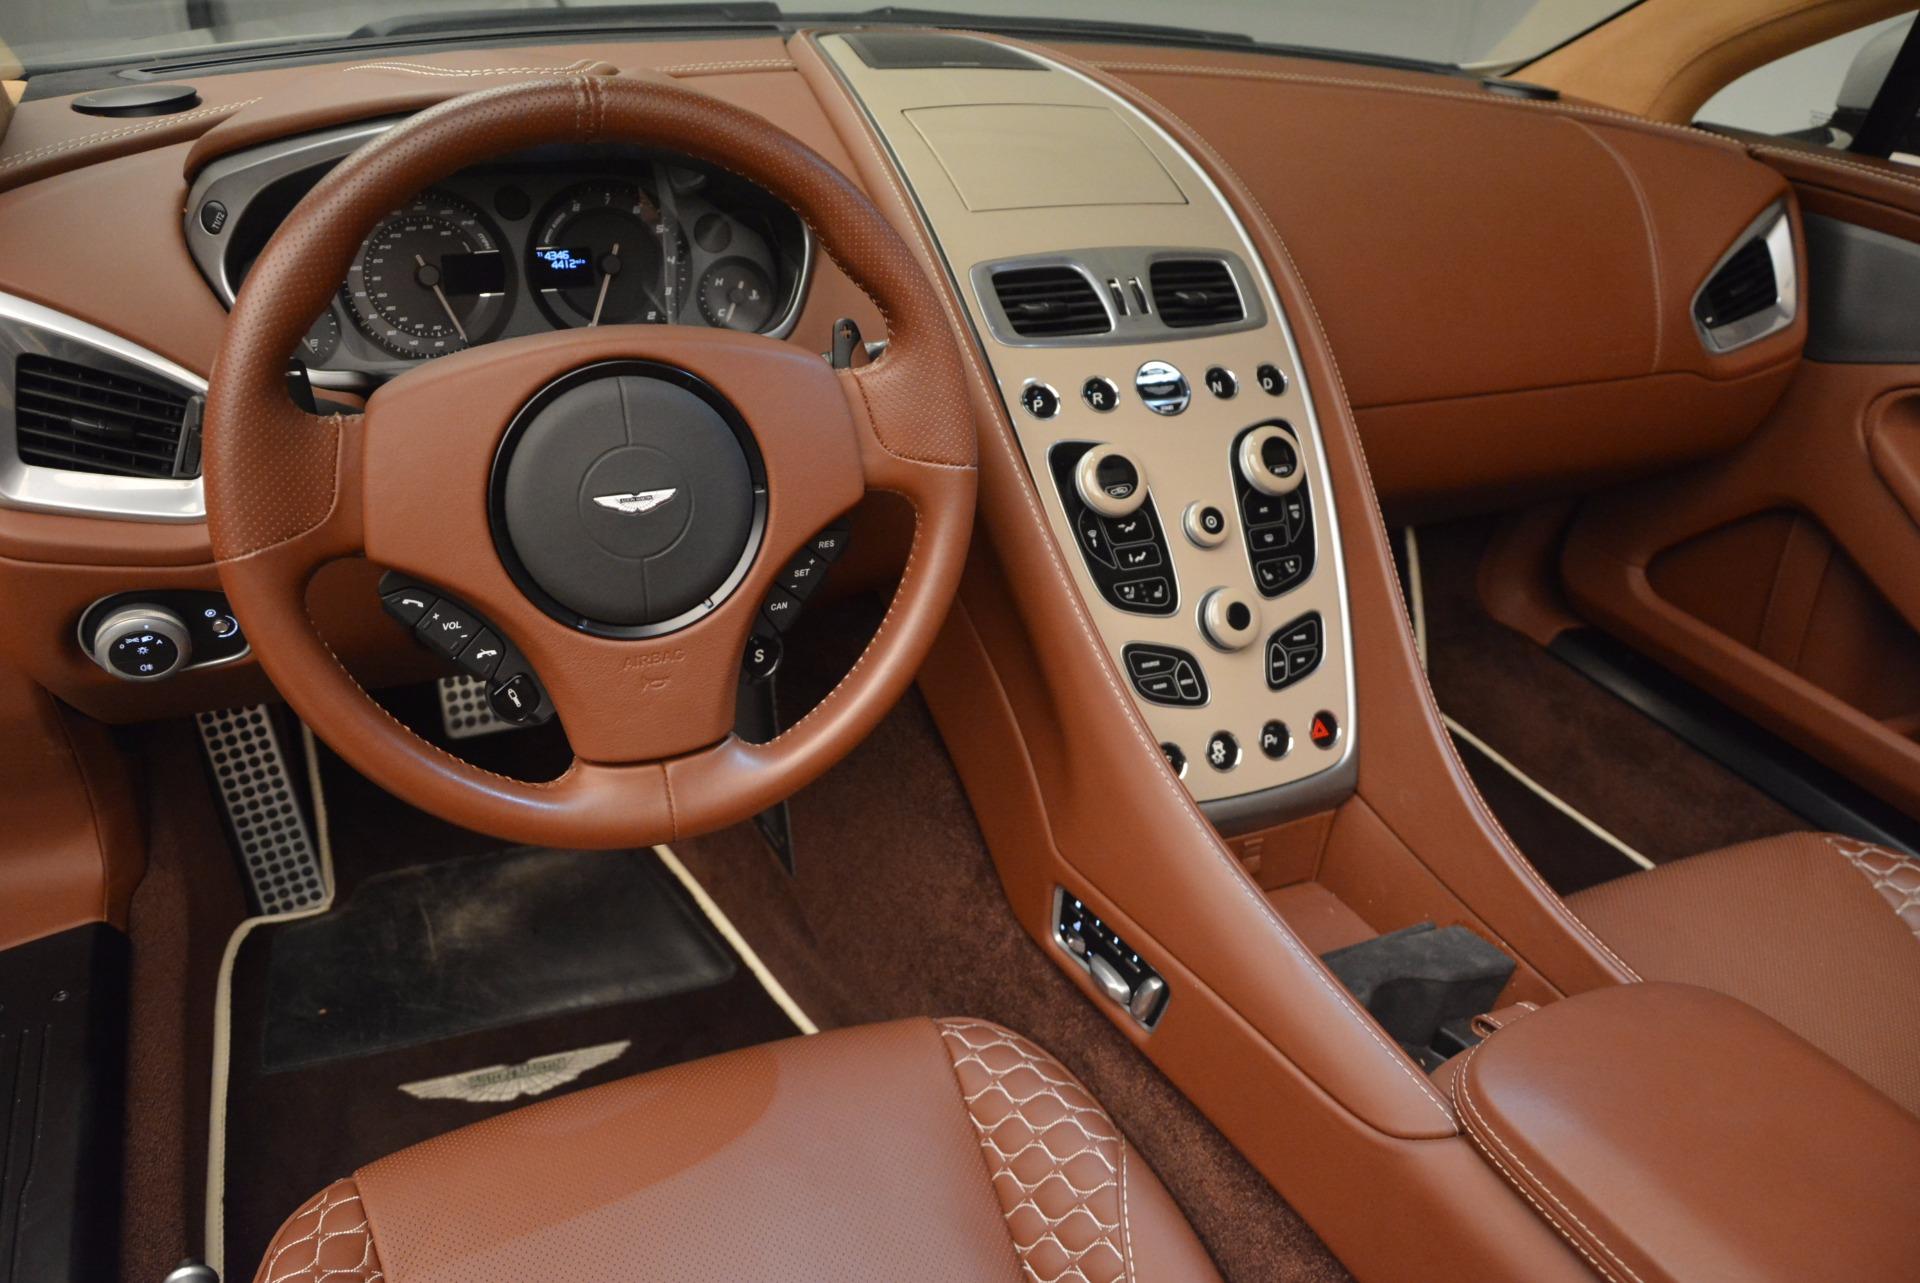 Used 2015 Aston Martin Vanquish Volante For Sale In Greenwich, CT 1448_p21